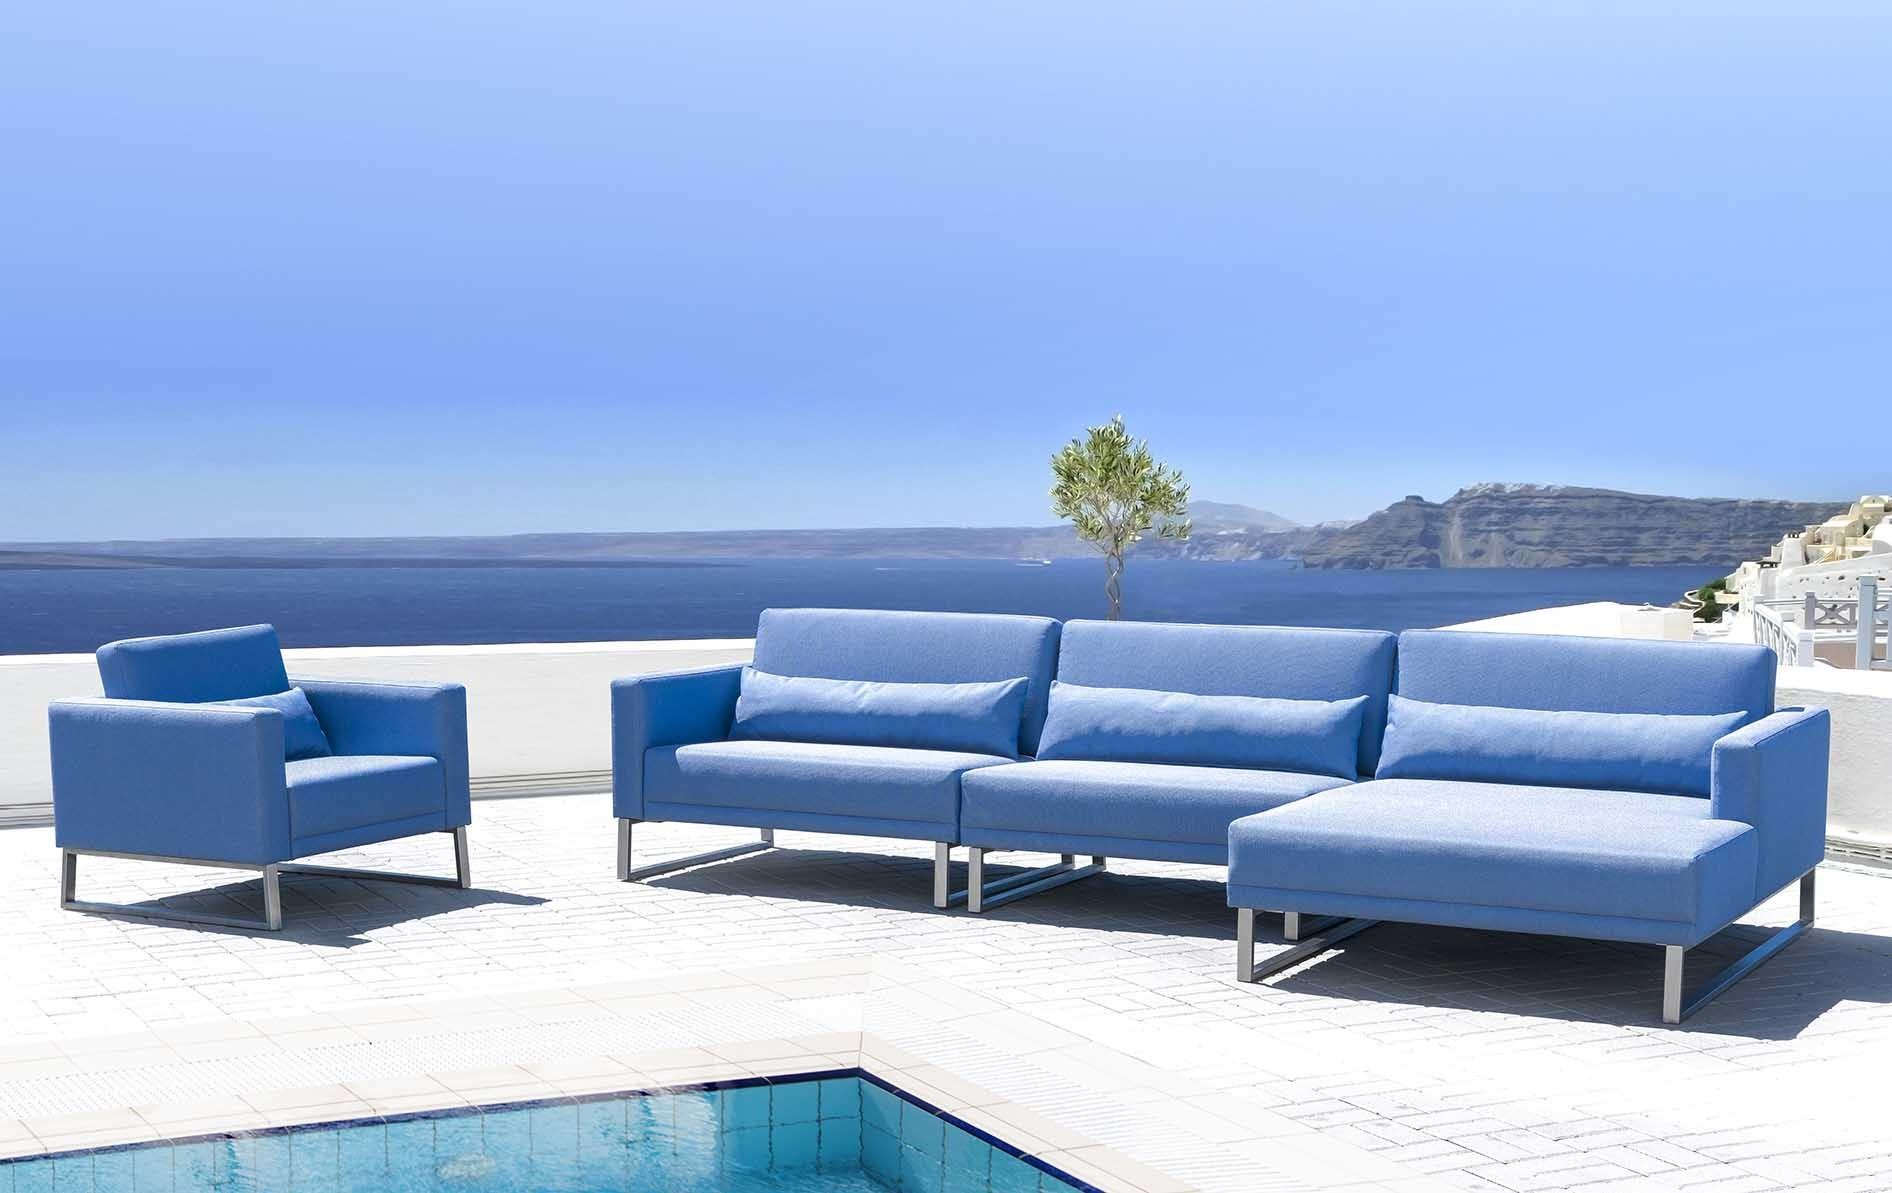 cubick element naro ny idealny na taras lub balkon. Black Bedroom Furniture Sets. Home Design Ideas